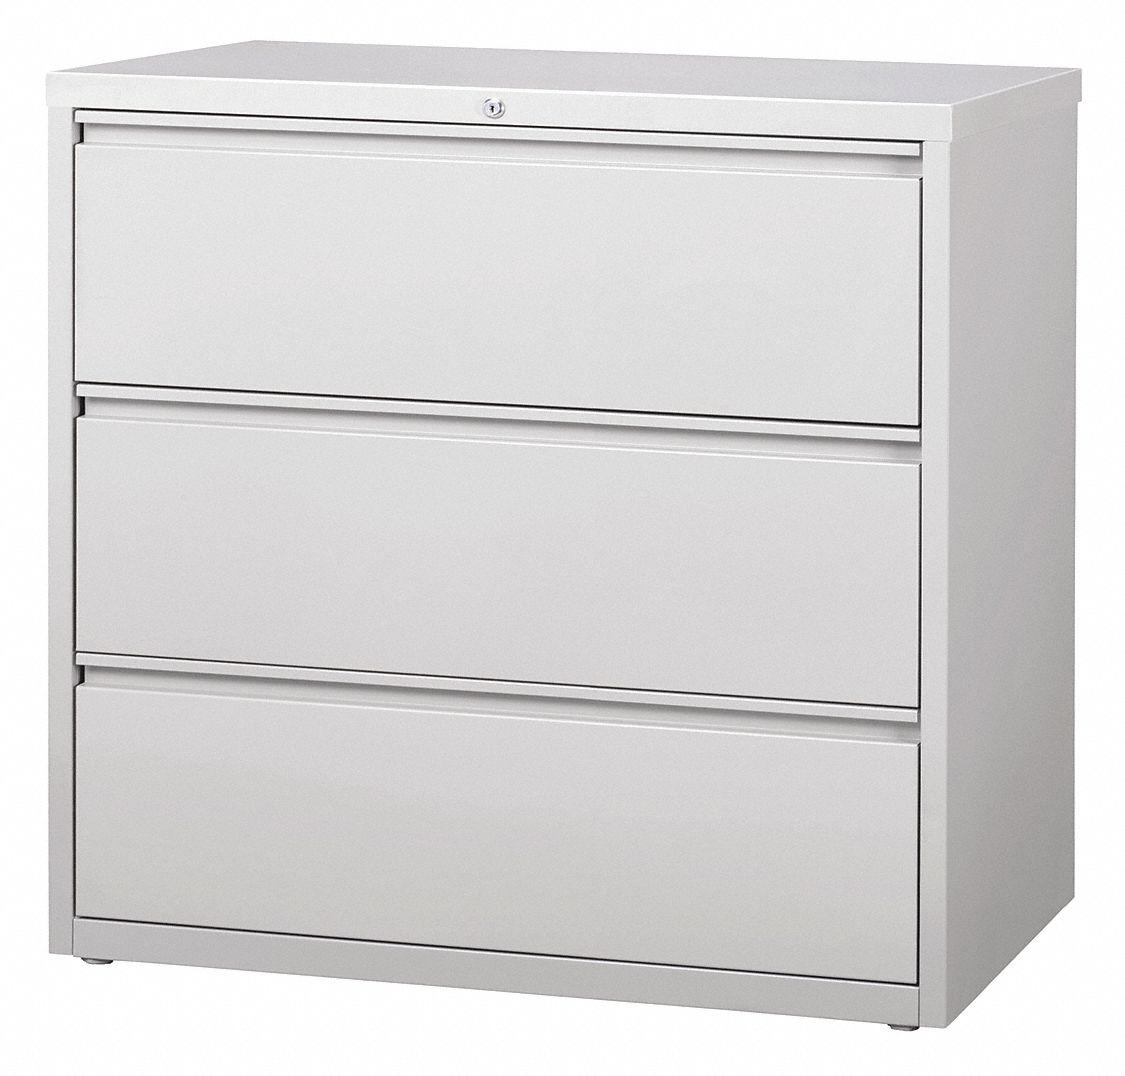 Hirsh 42 X 18 63 40 3 Drawer Hl8000 Series Lateral File Cabinet Light Gray 48yc29 17645 Grainger